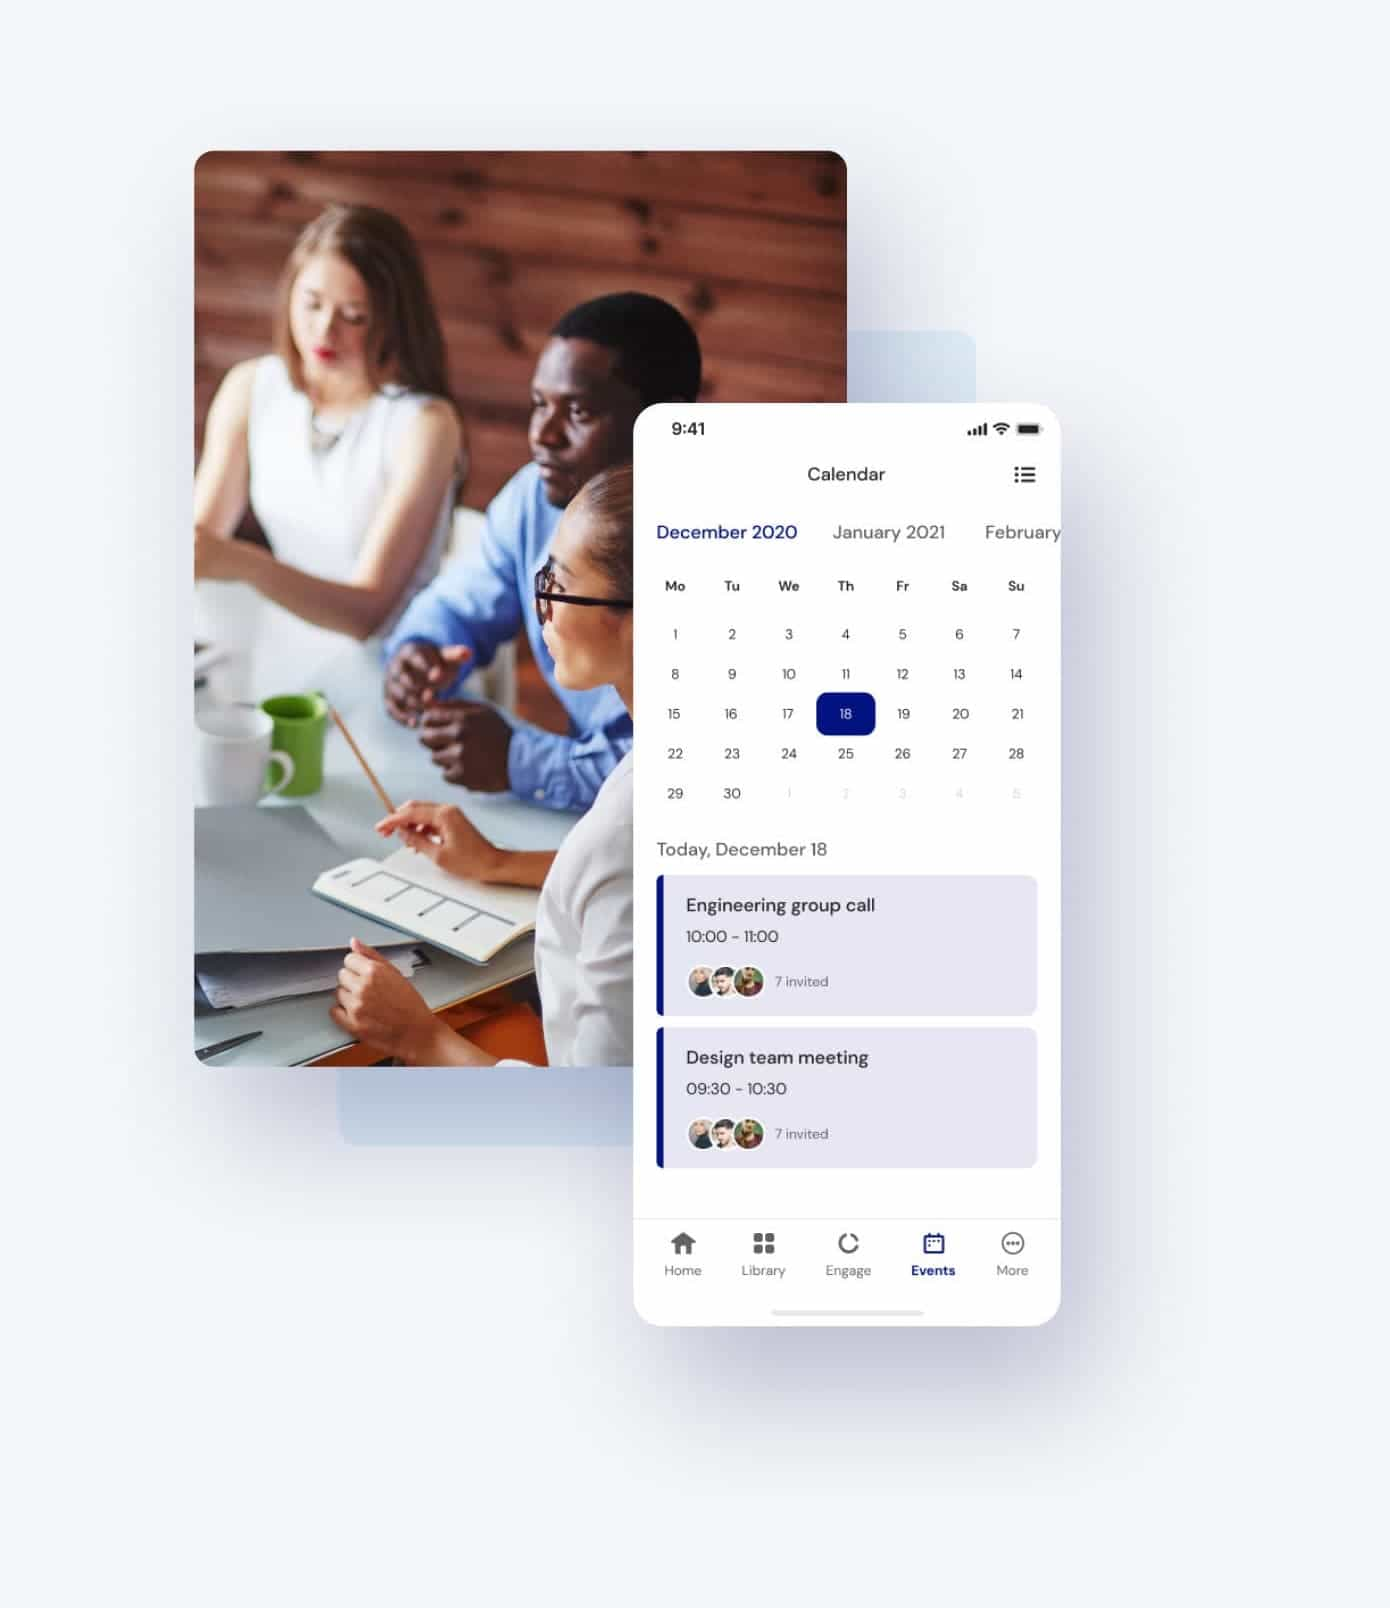 Qualee Employee Onboarding App - Centralised Calendar Feature